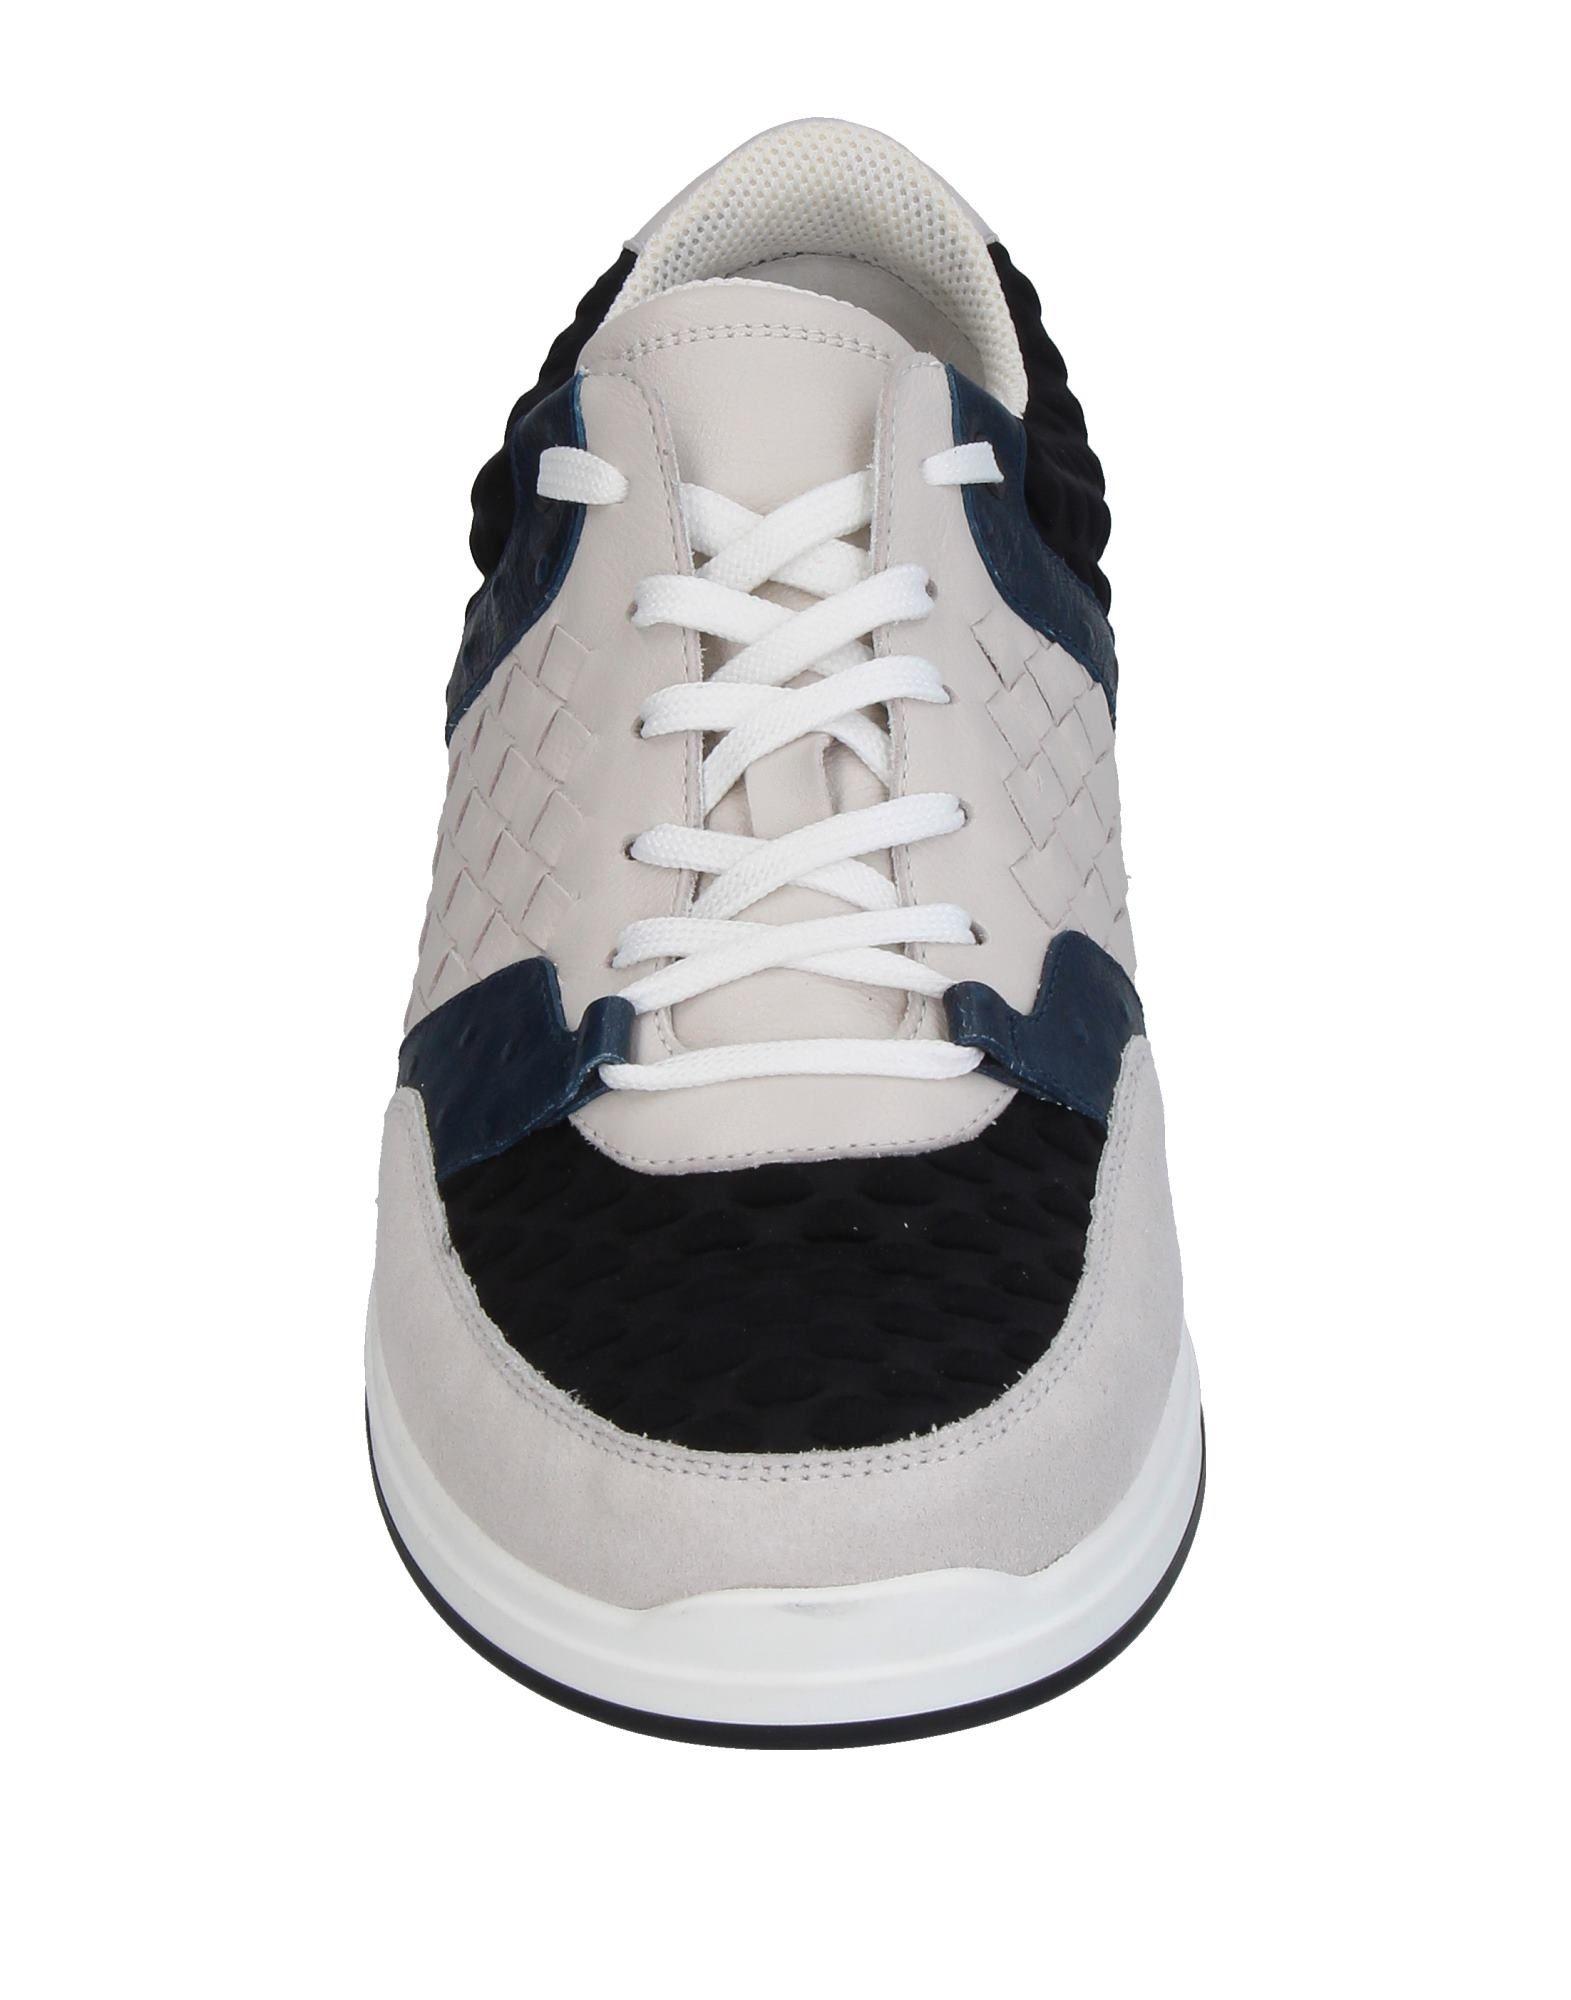 Bottega Veneta Sneakers Herren  11414903PH Gute Qualität beliebte Schuhe